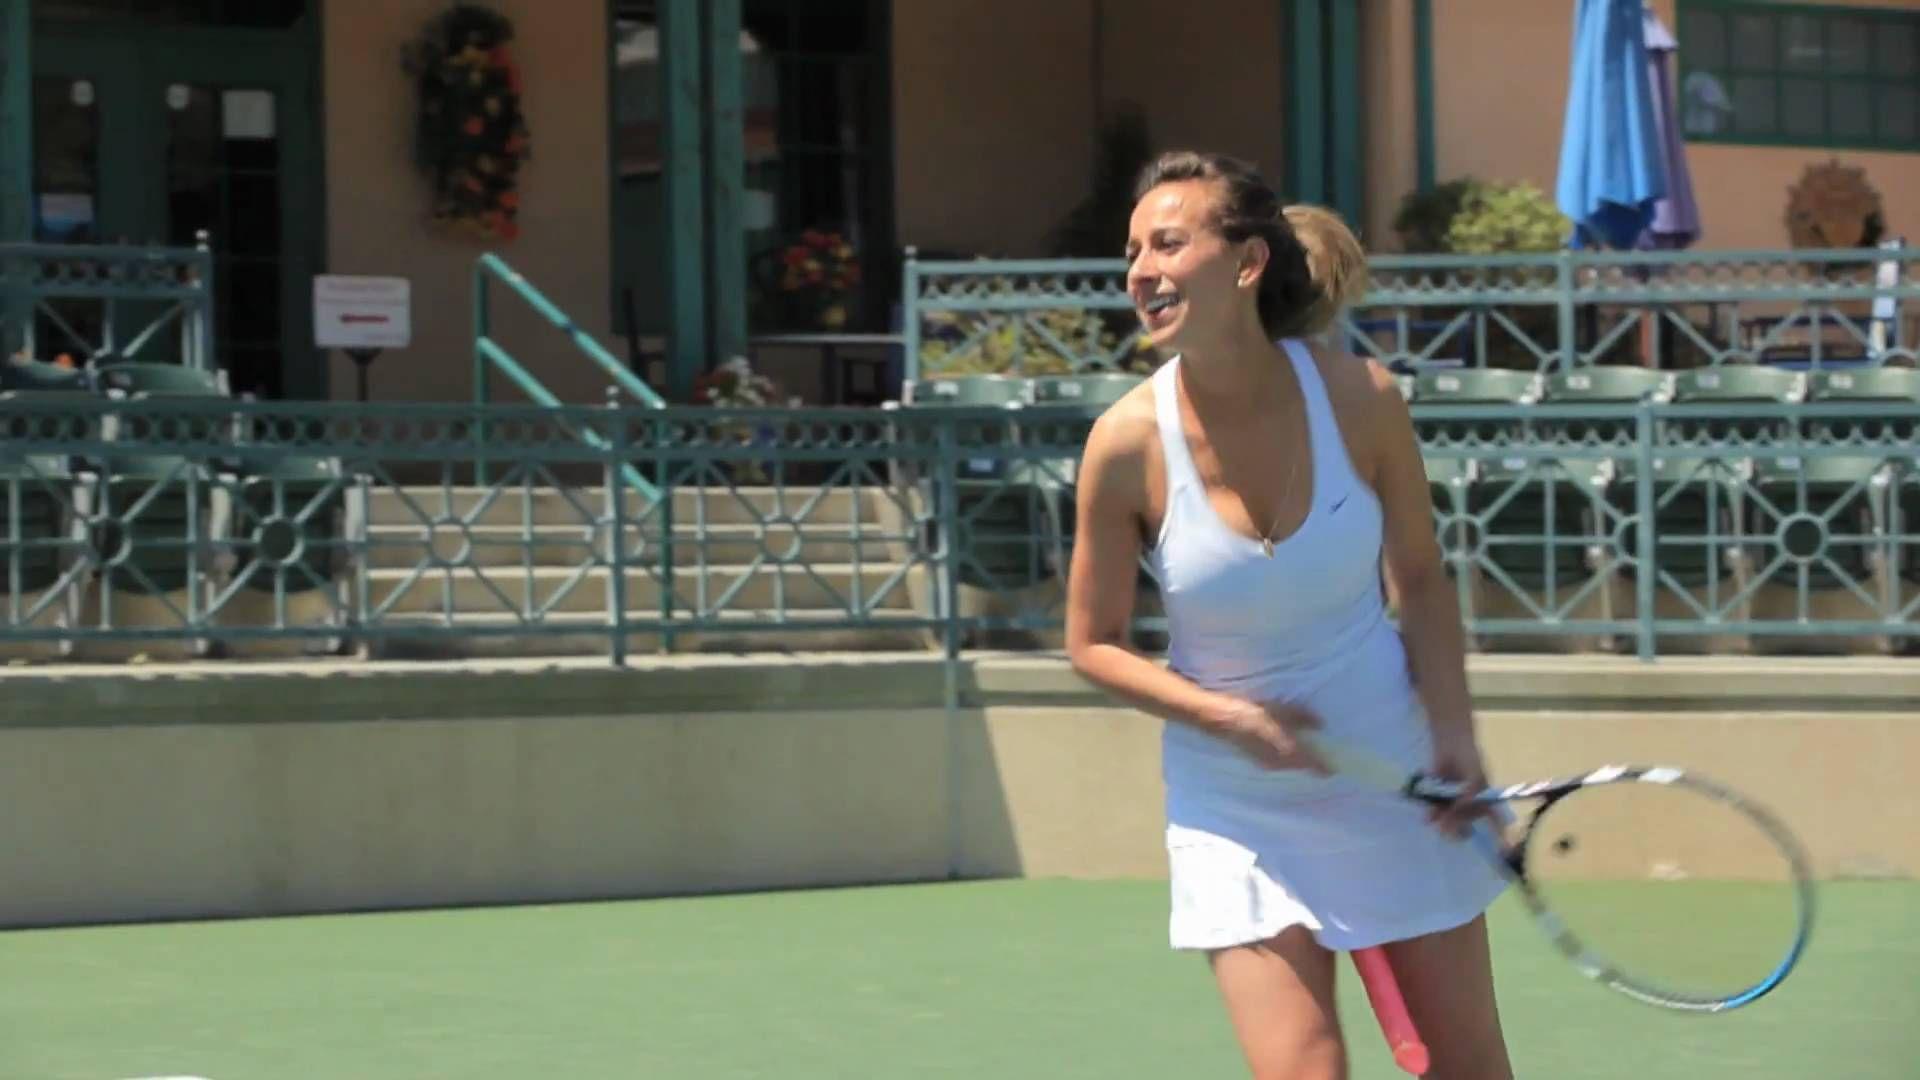 Tennis racket dildo